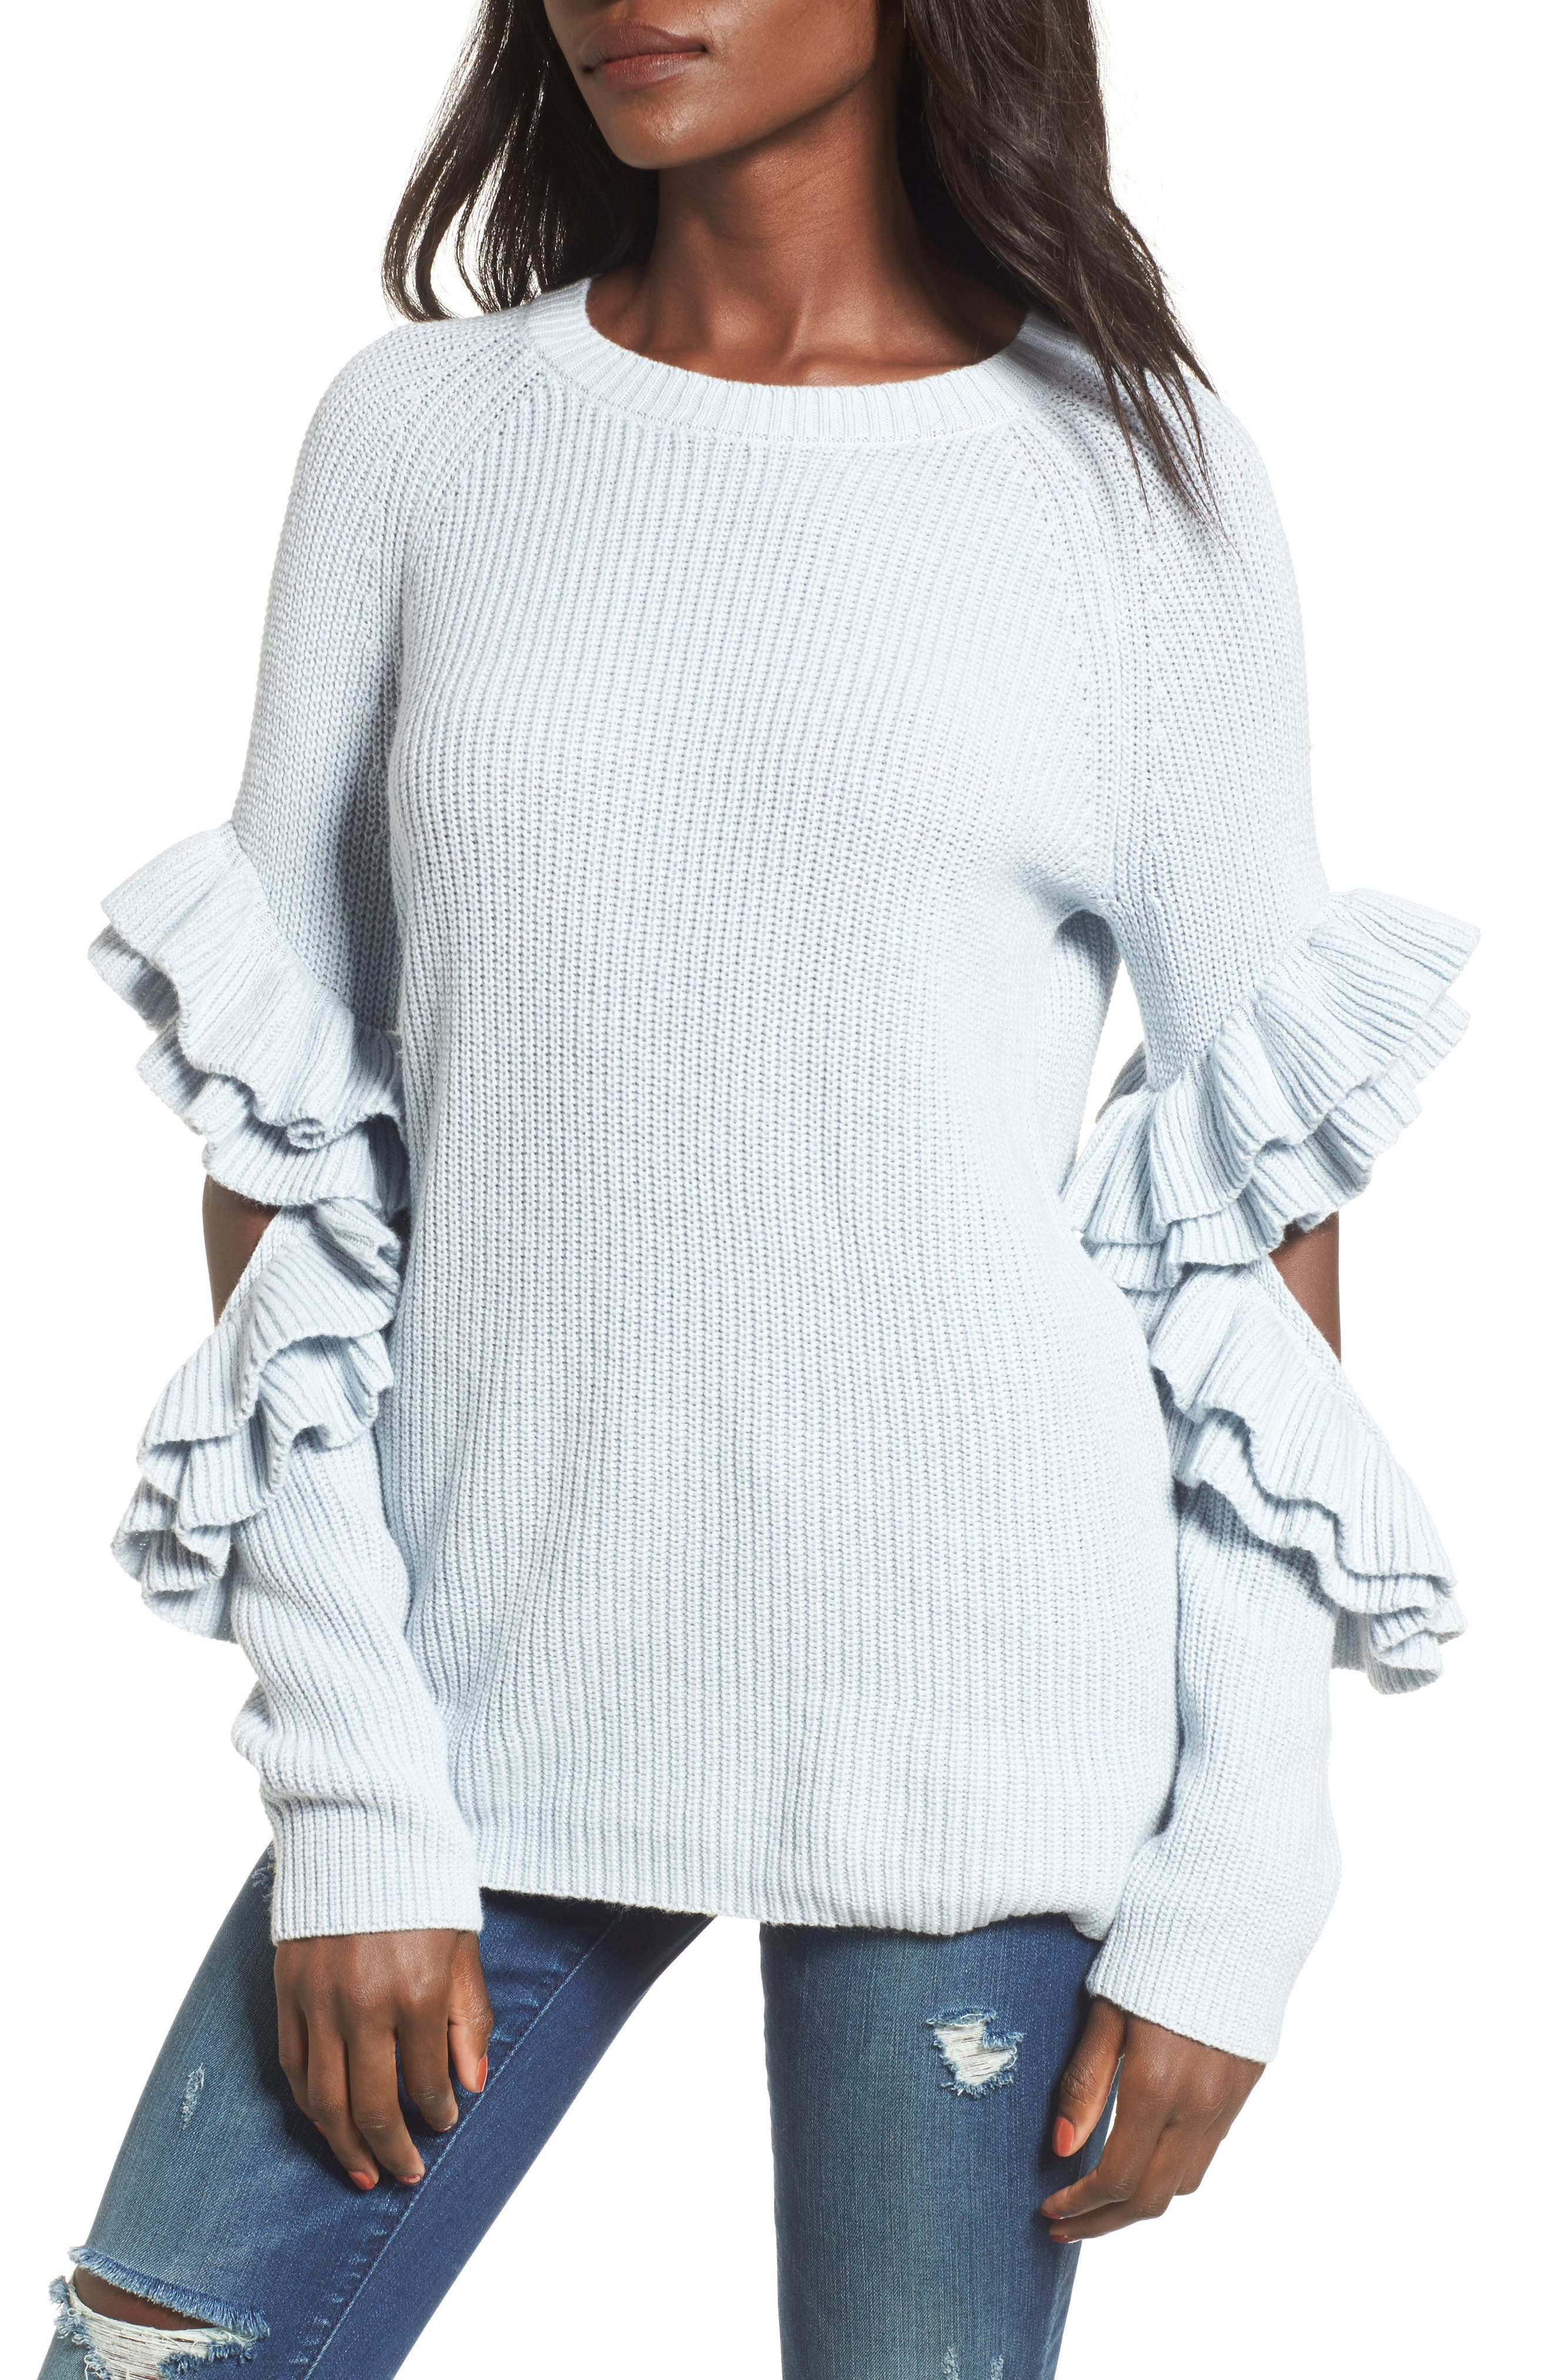 Main Image - BP. Elbow Cutout Ruffle Sweater